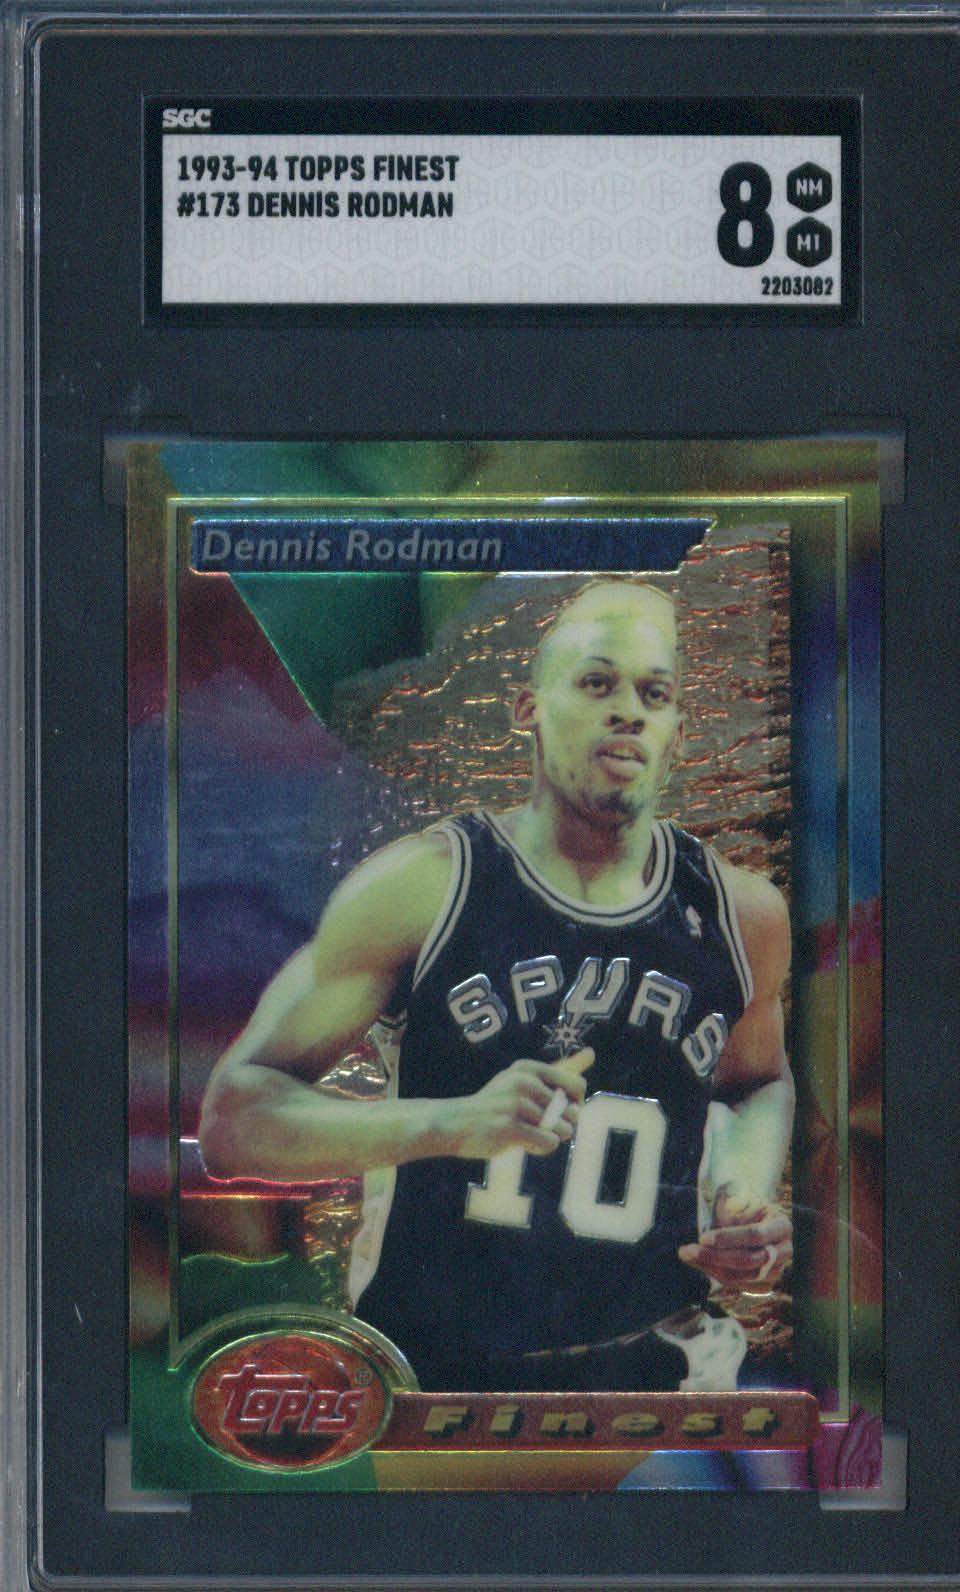 1993-94 Topps Finest #173 Dennis Rodman SGC 8